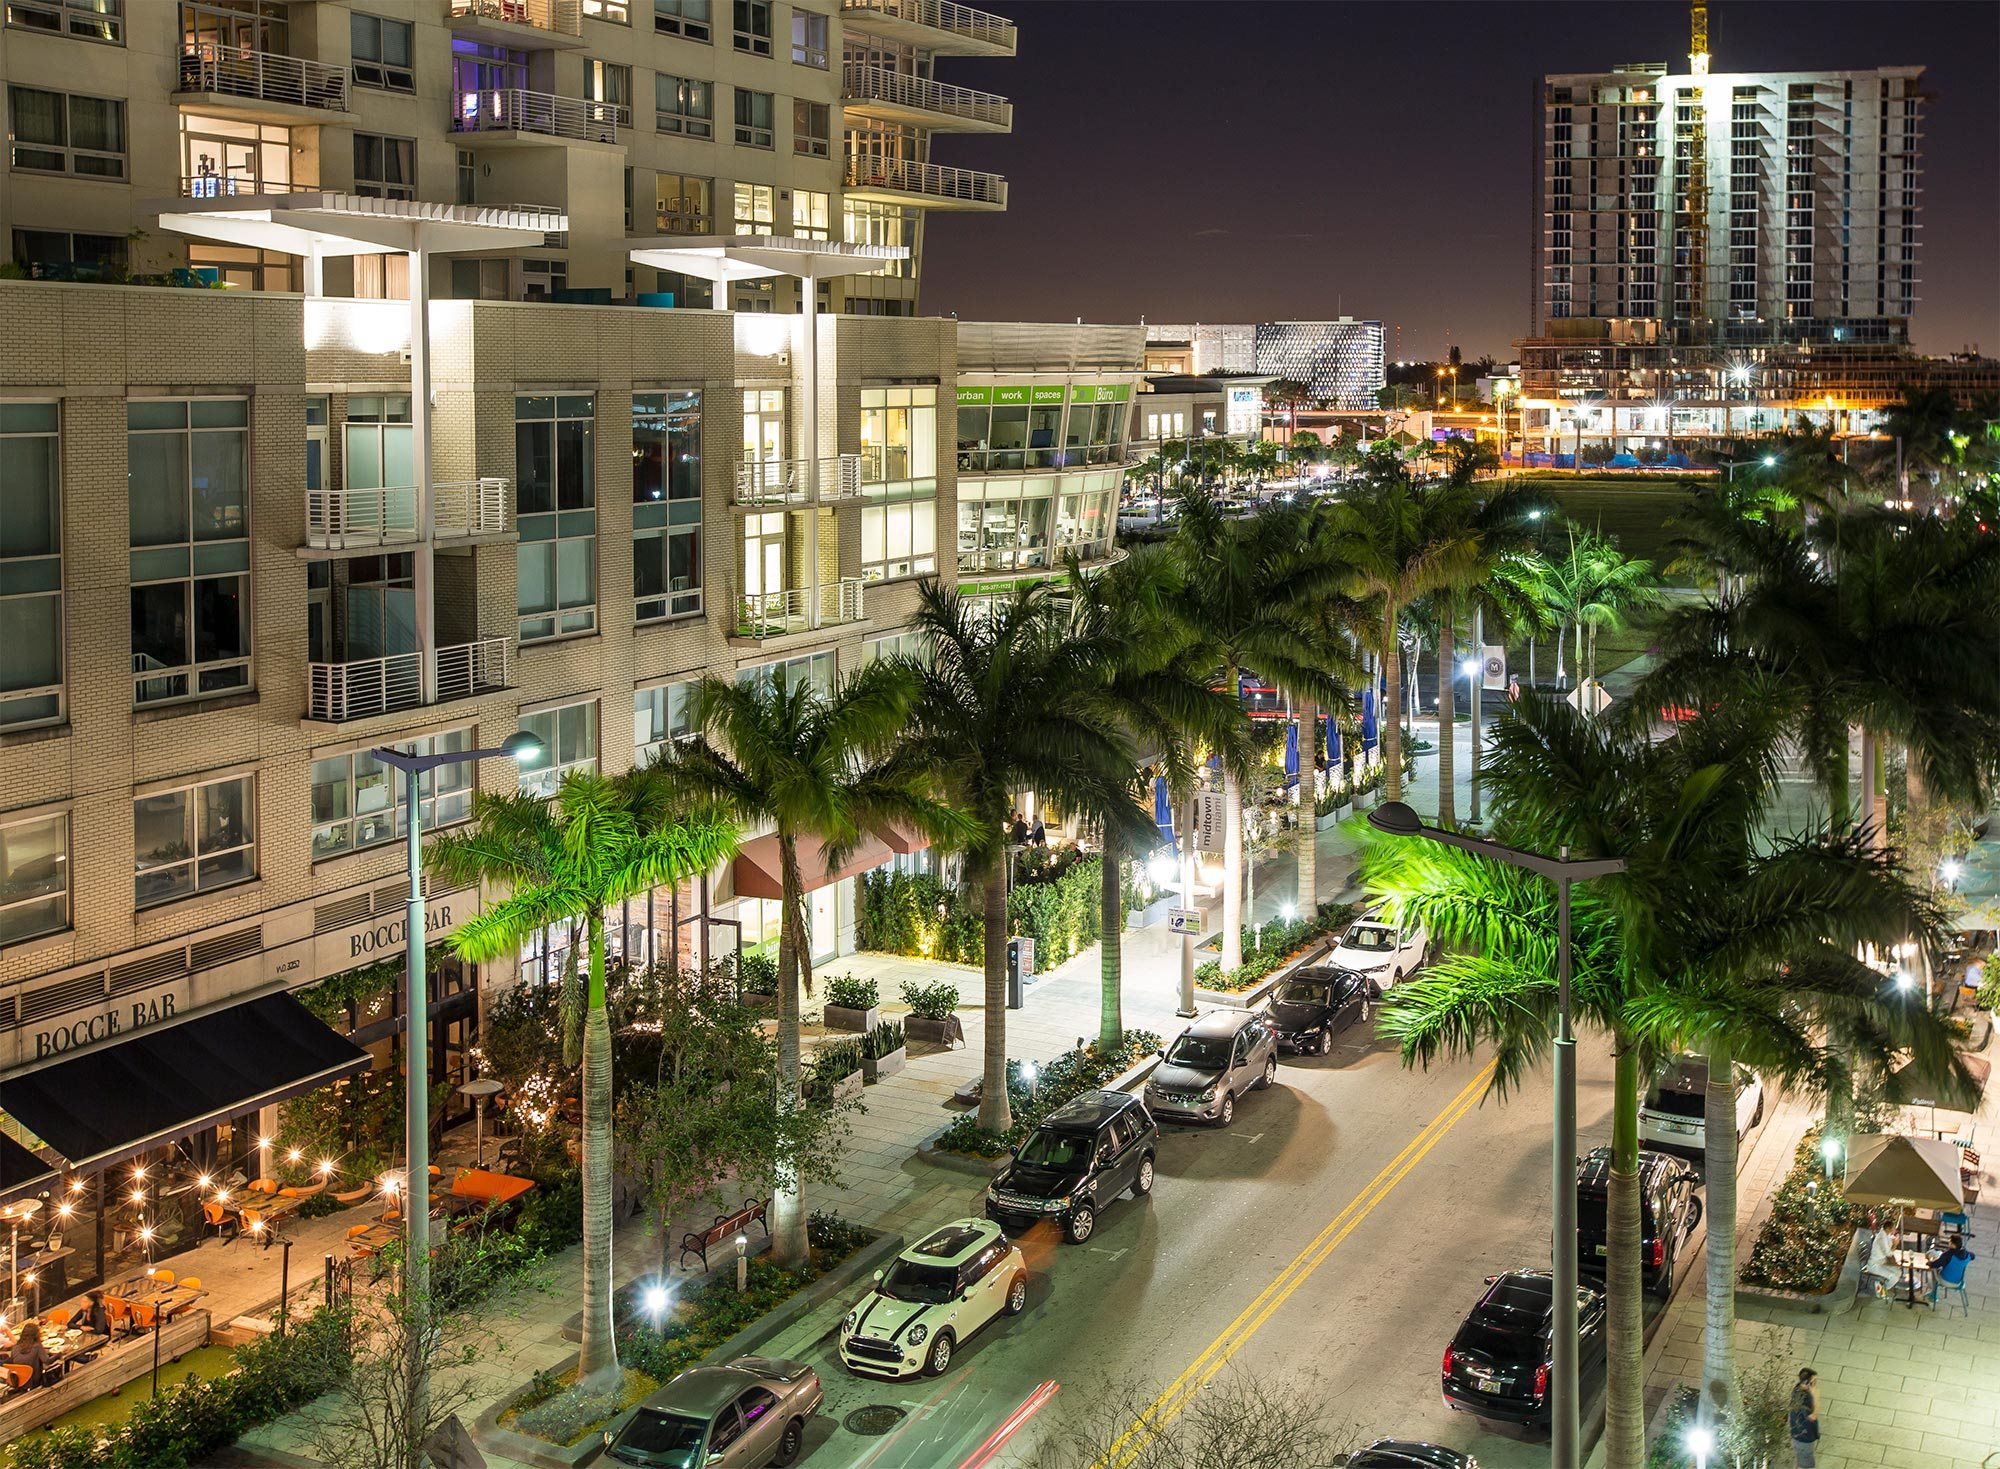 Miami photogallery 37